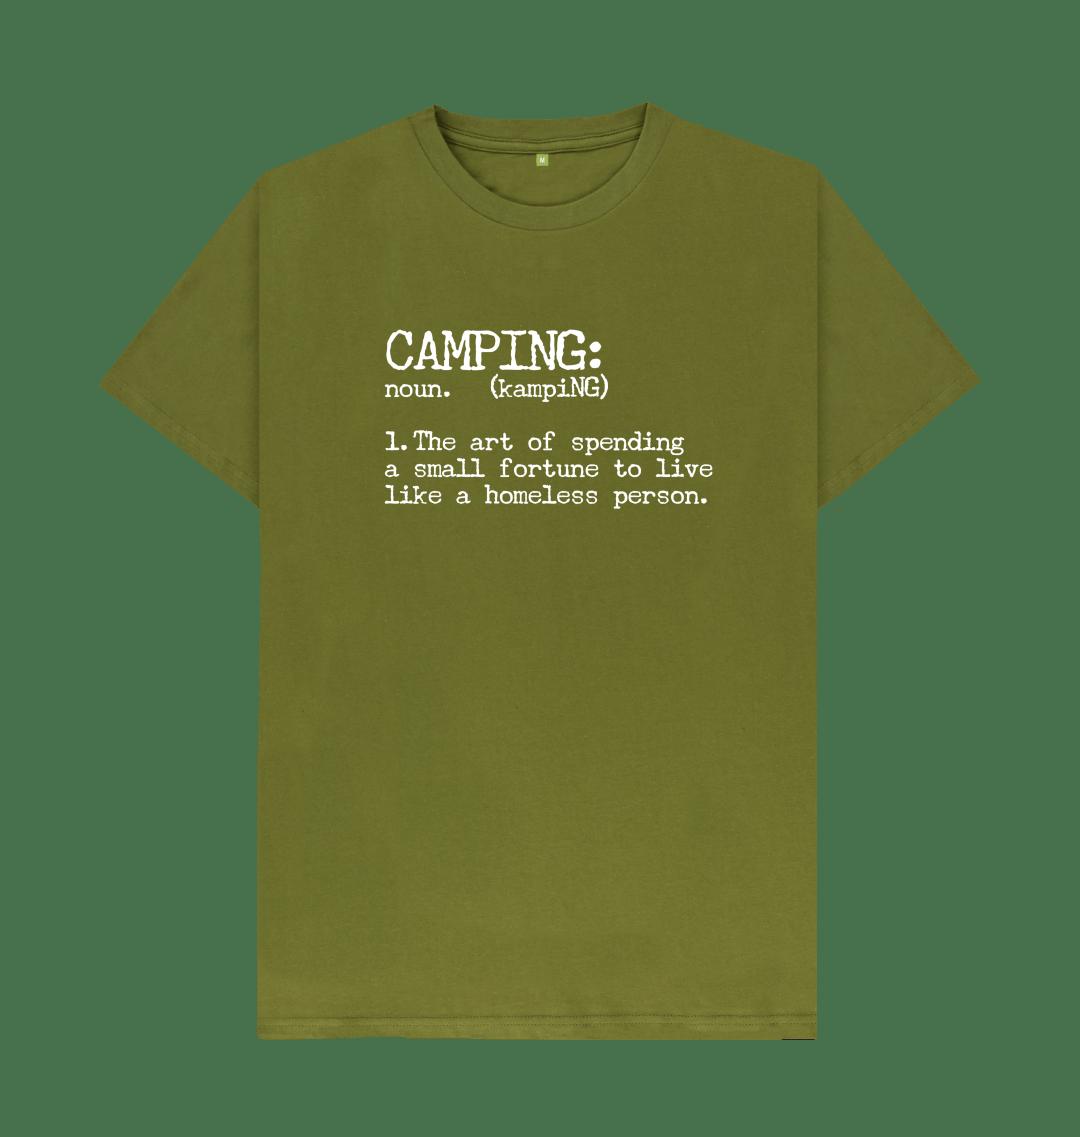 Camping Definition Funny Mens T Shirt Top - Organic Cotton, Vegan moss green